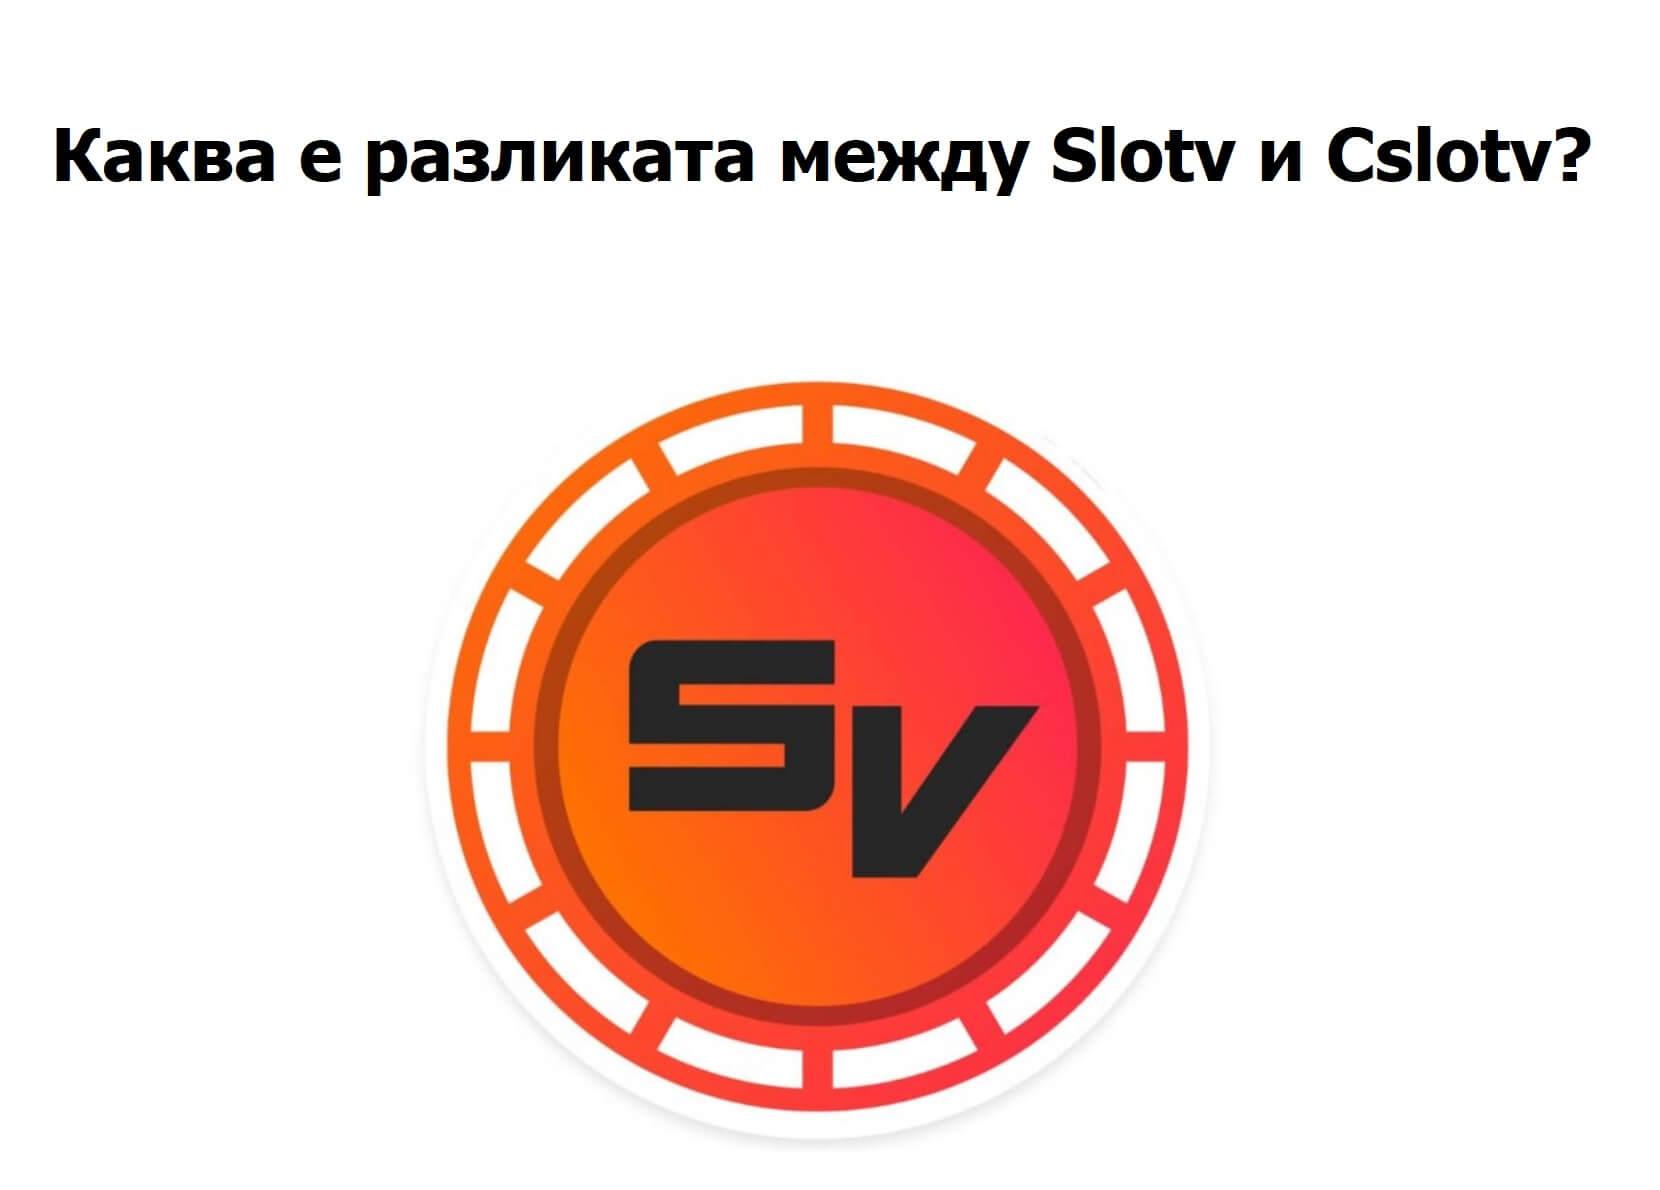 Cslotv алтернативен линк за SlotV